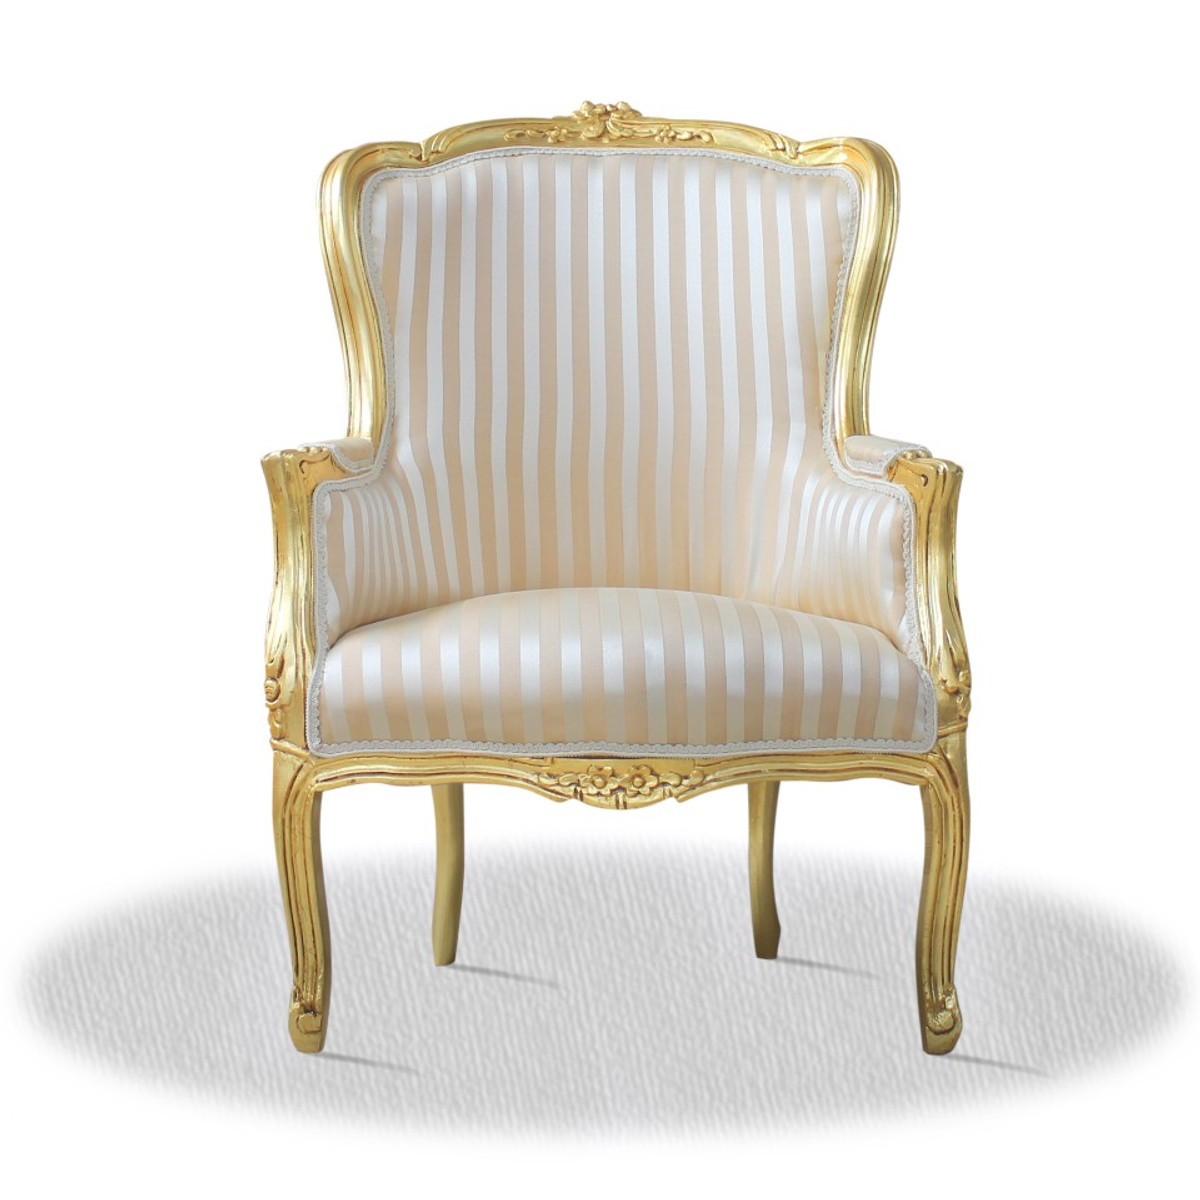 Casa Padrino Barock Antik Stil Salon Sessel 70 X 65 X H 100 Cm